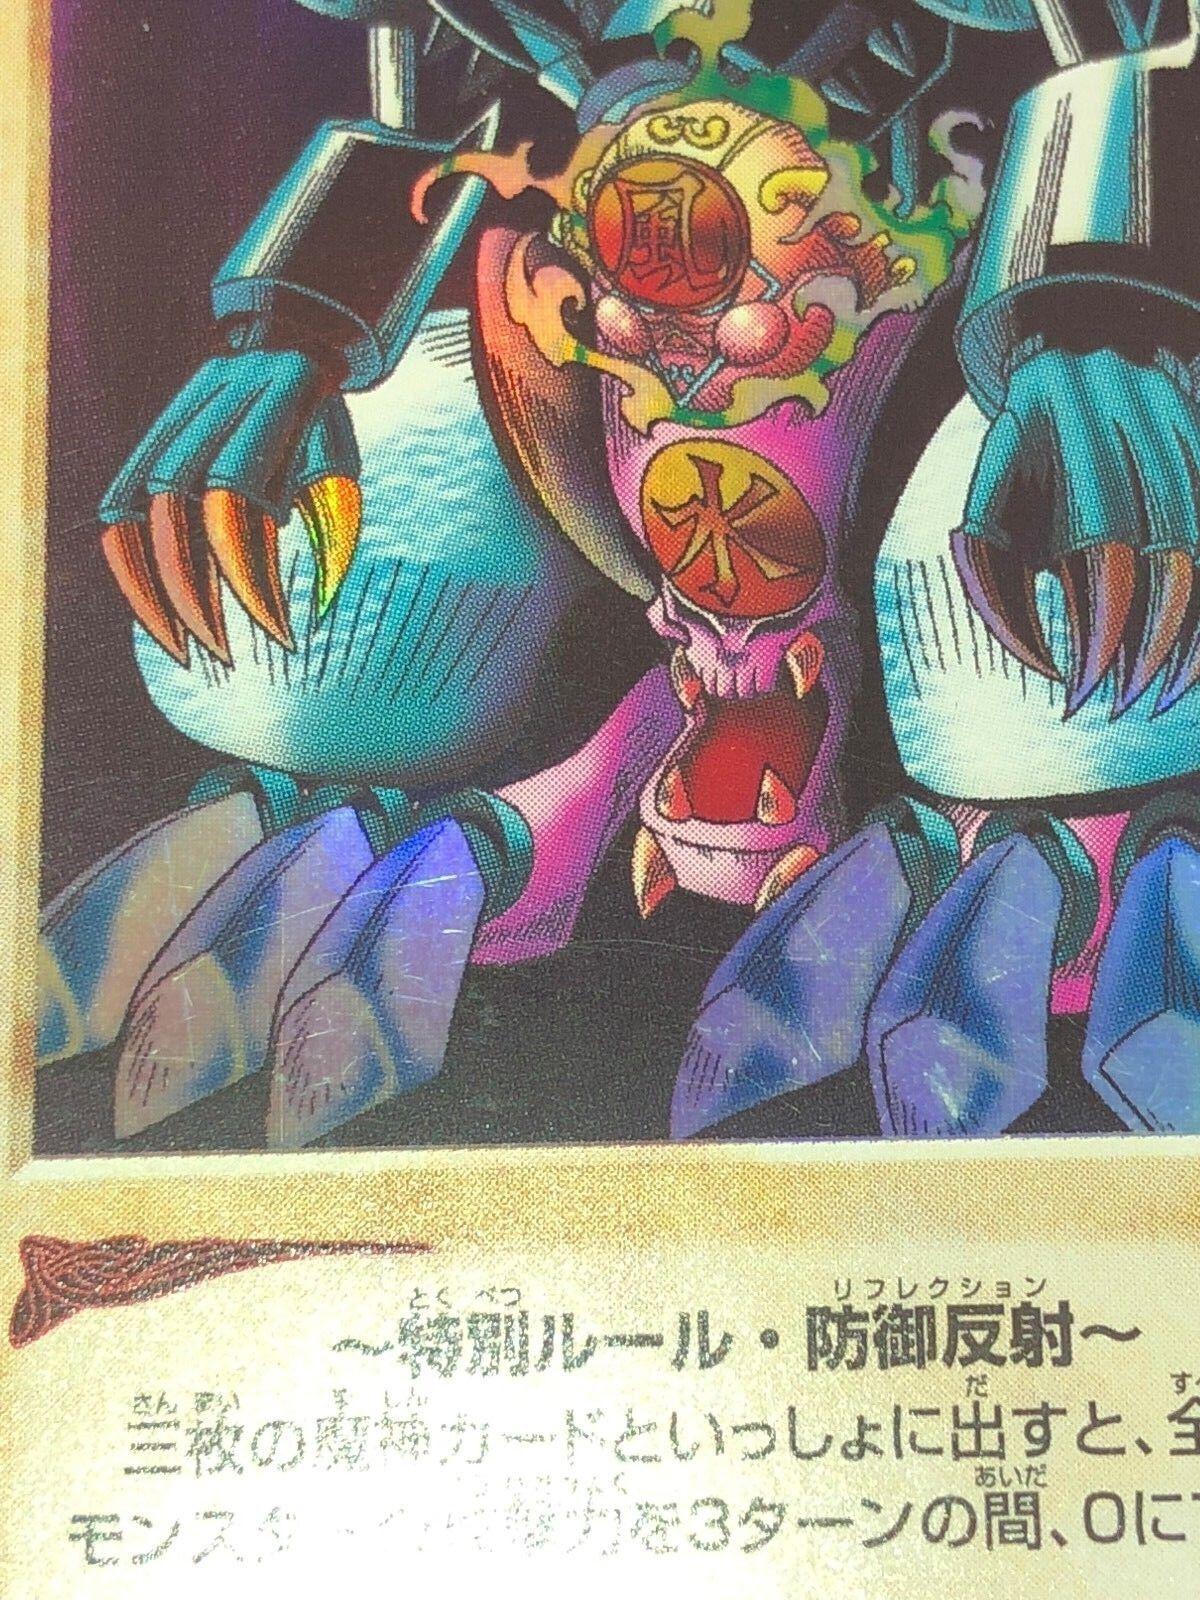 Yu-Gi-Oh Gate Guardian Bandai J3 J3 J3  Japanese 1998 JUMP Limited-7000 Card Near Mint 59099e